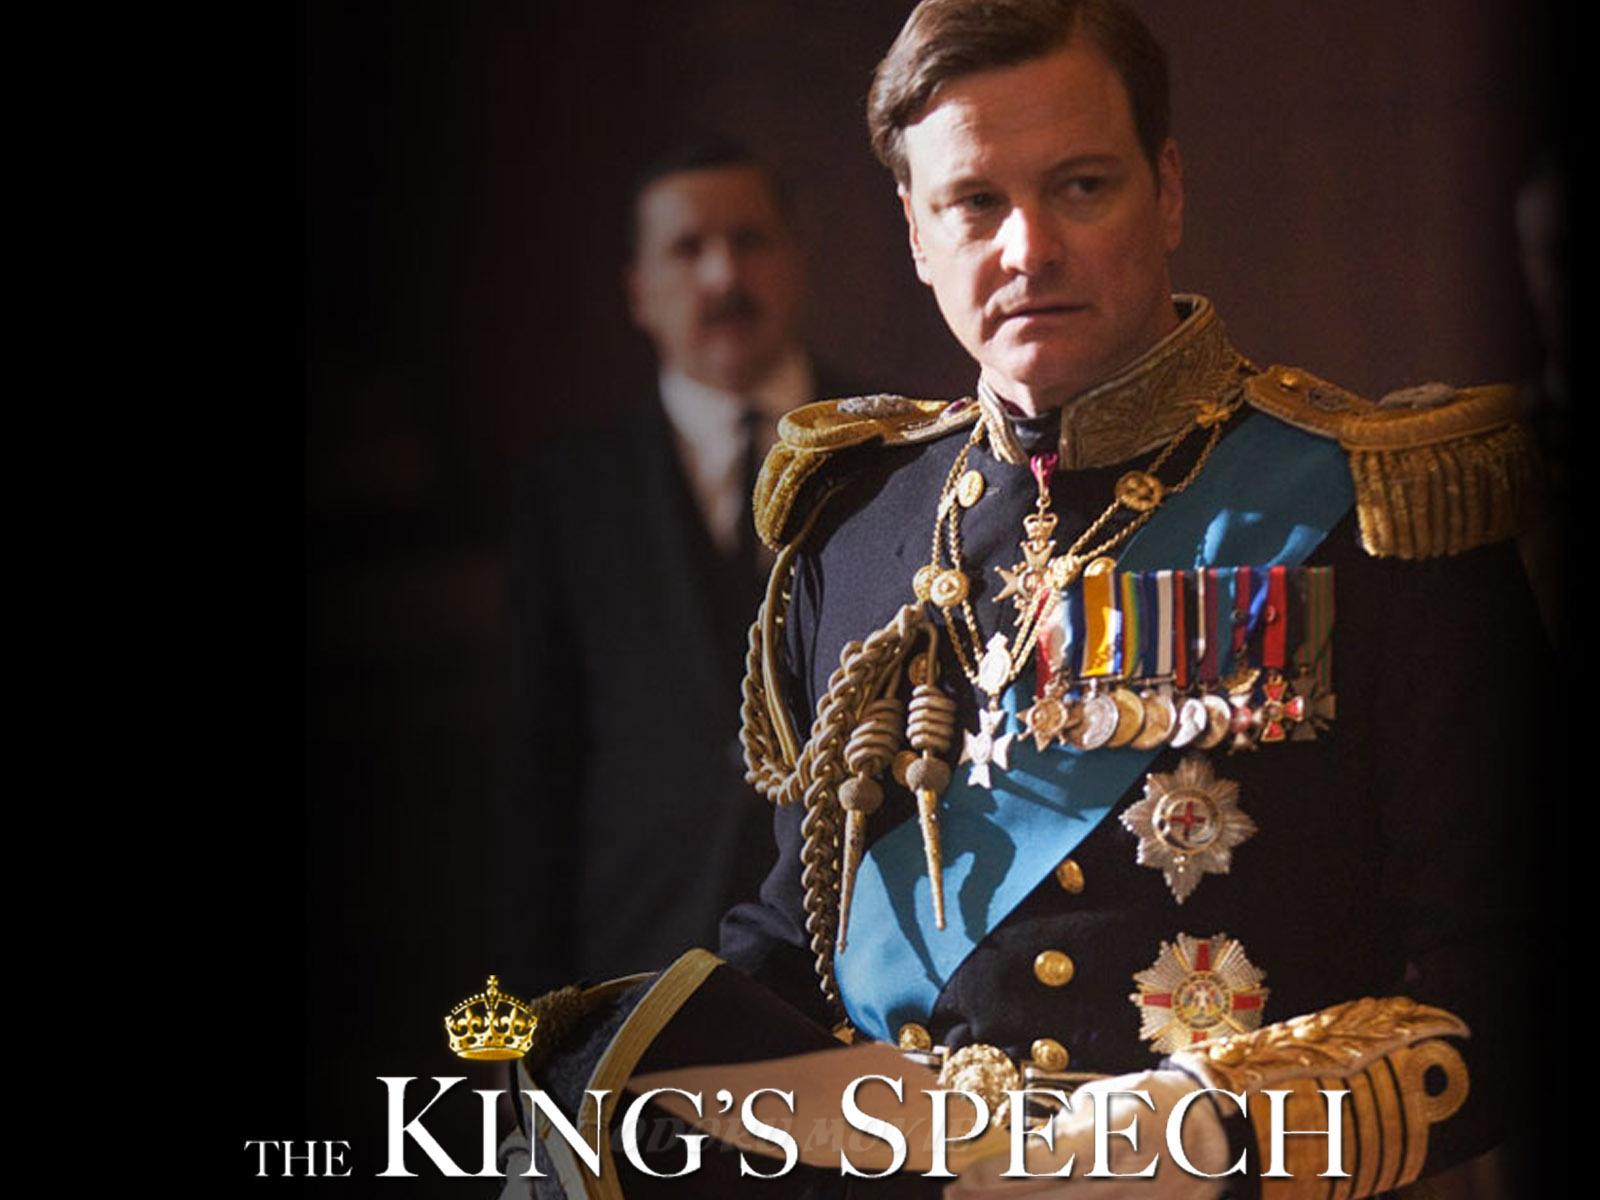 the_kings_speech 英国王のスピーチ